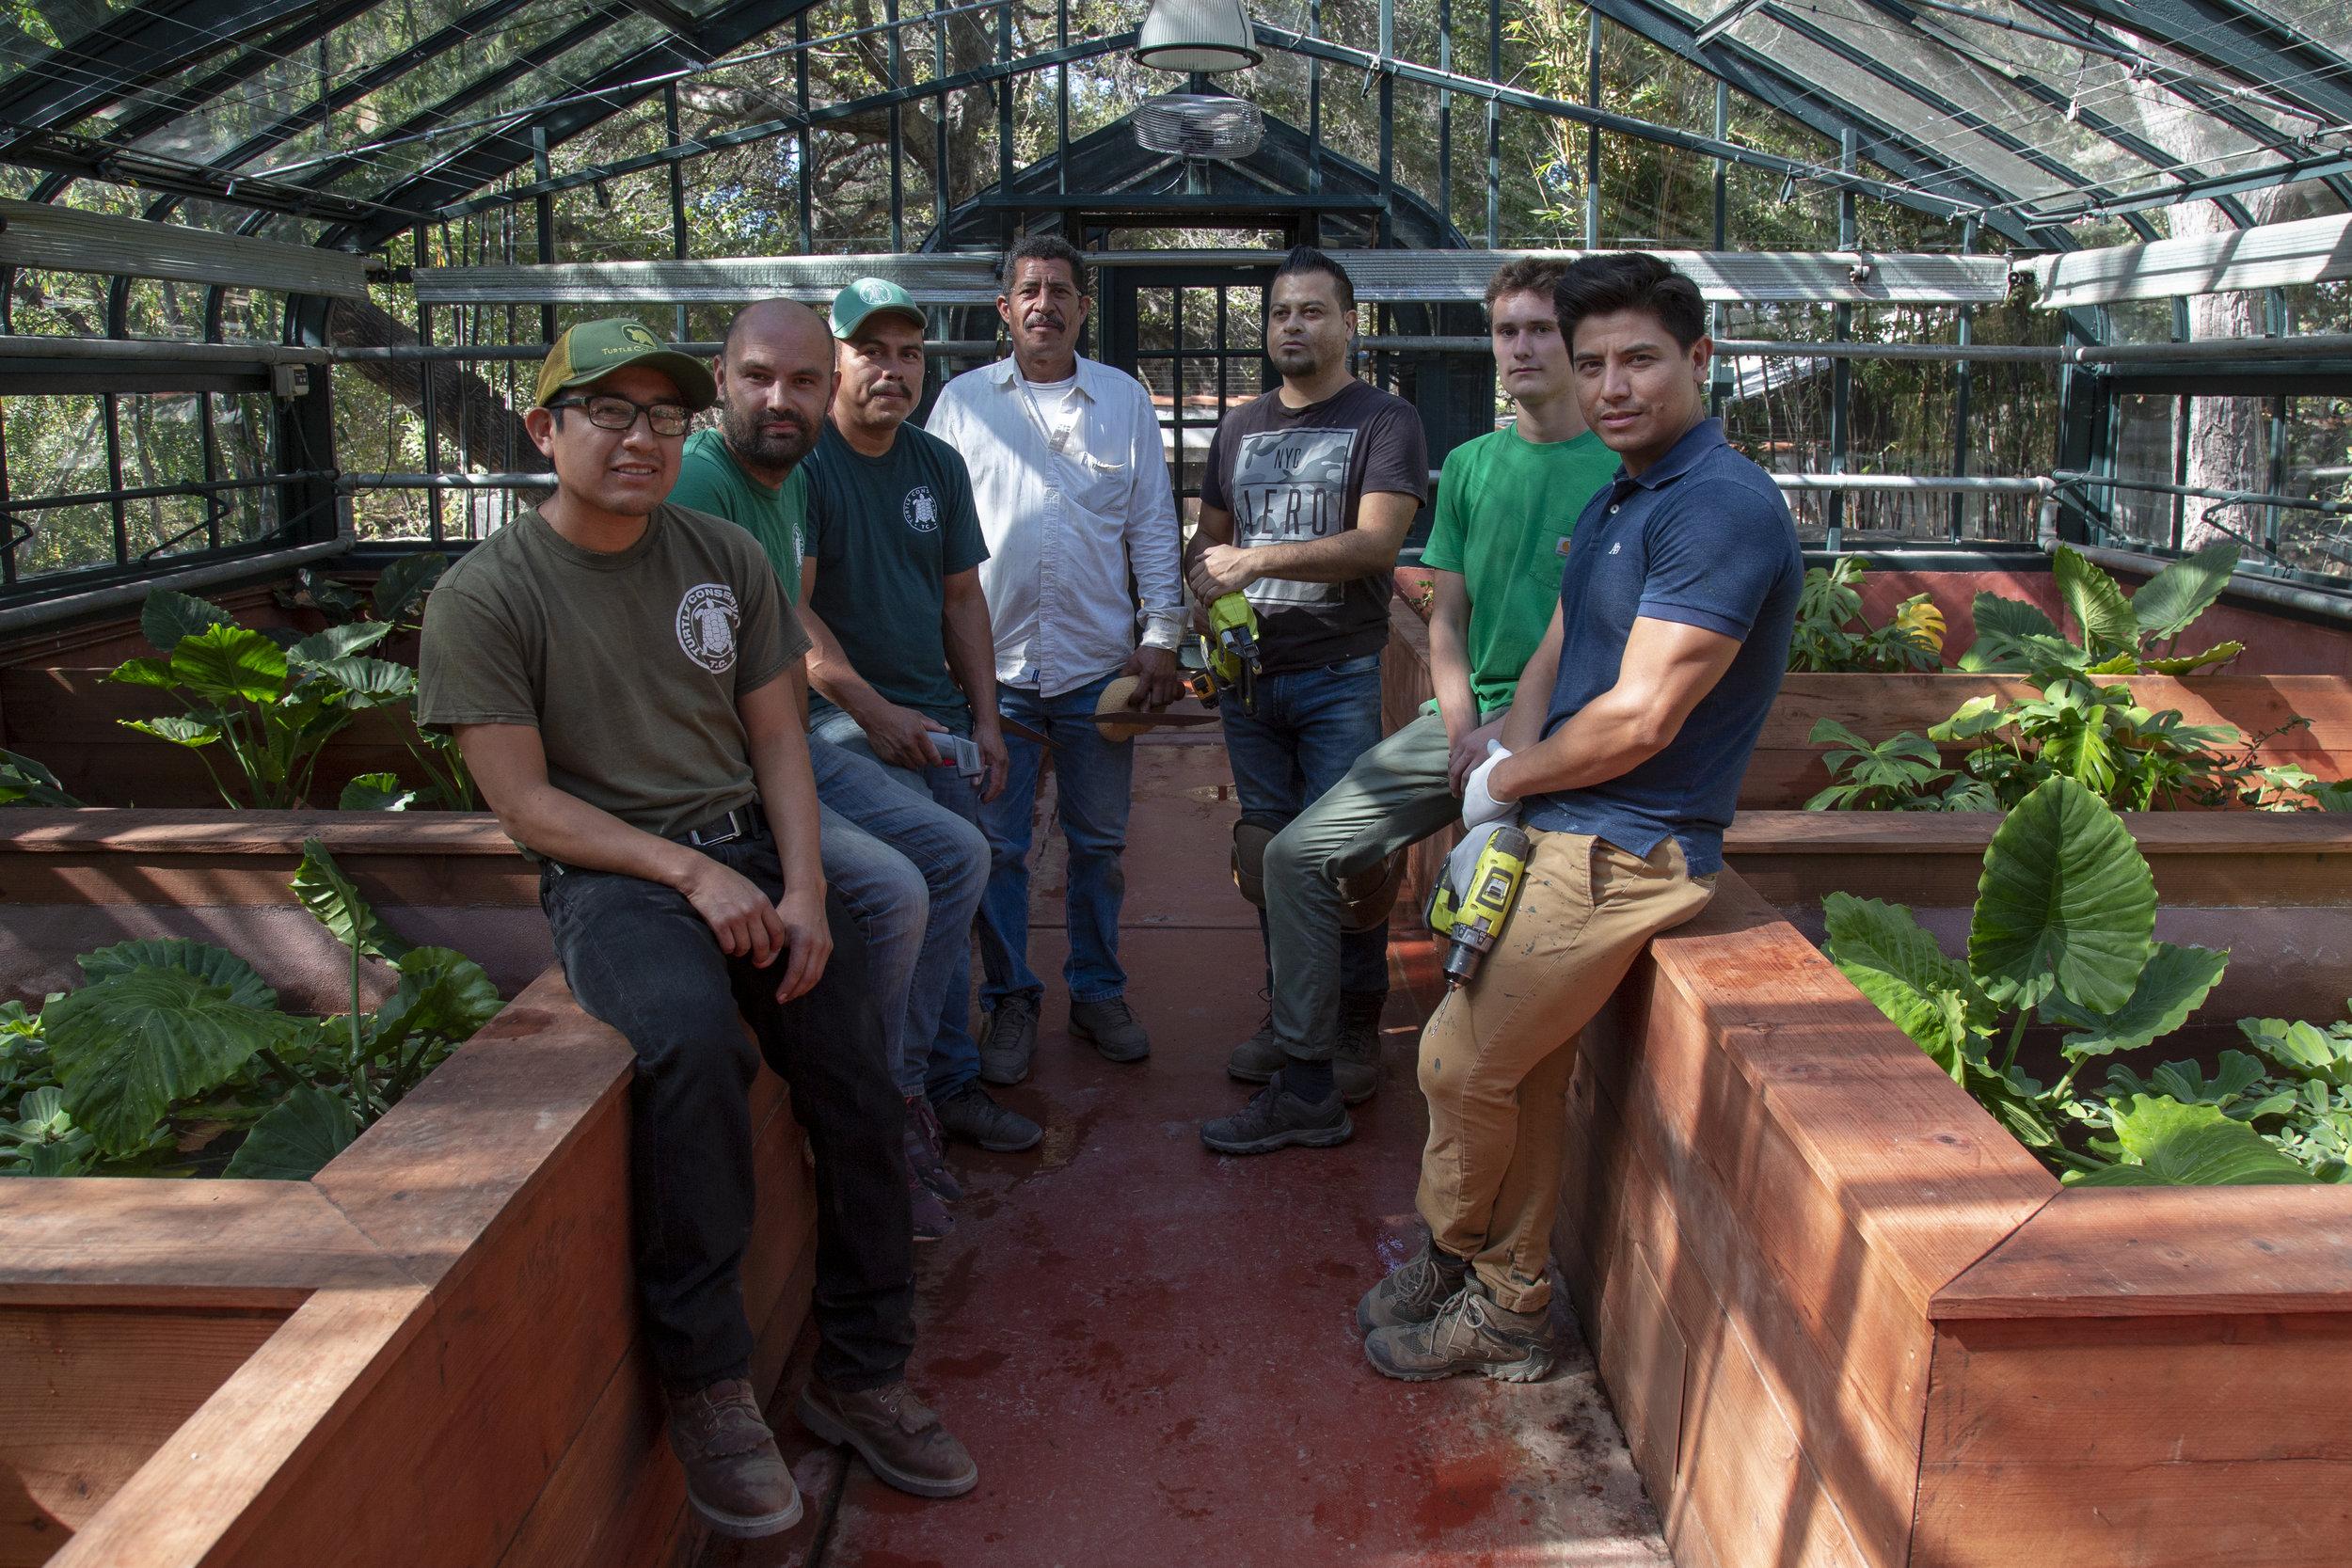 From Left: Juan, Lukasz, Armando, Noel, Julio, Simon, Oscar